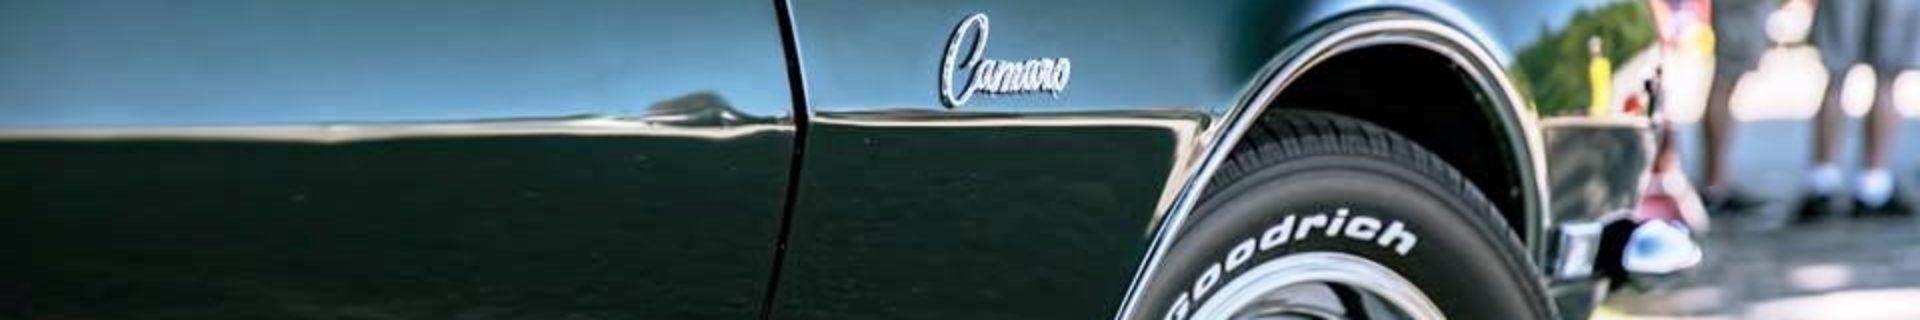 Camaros of Michigan